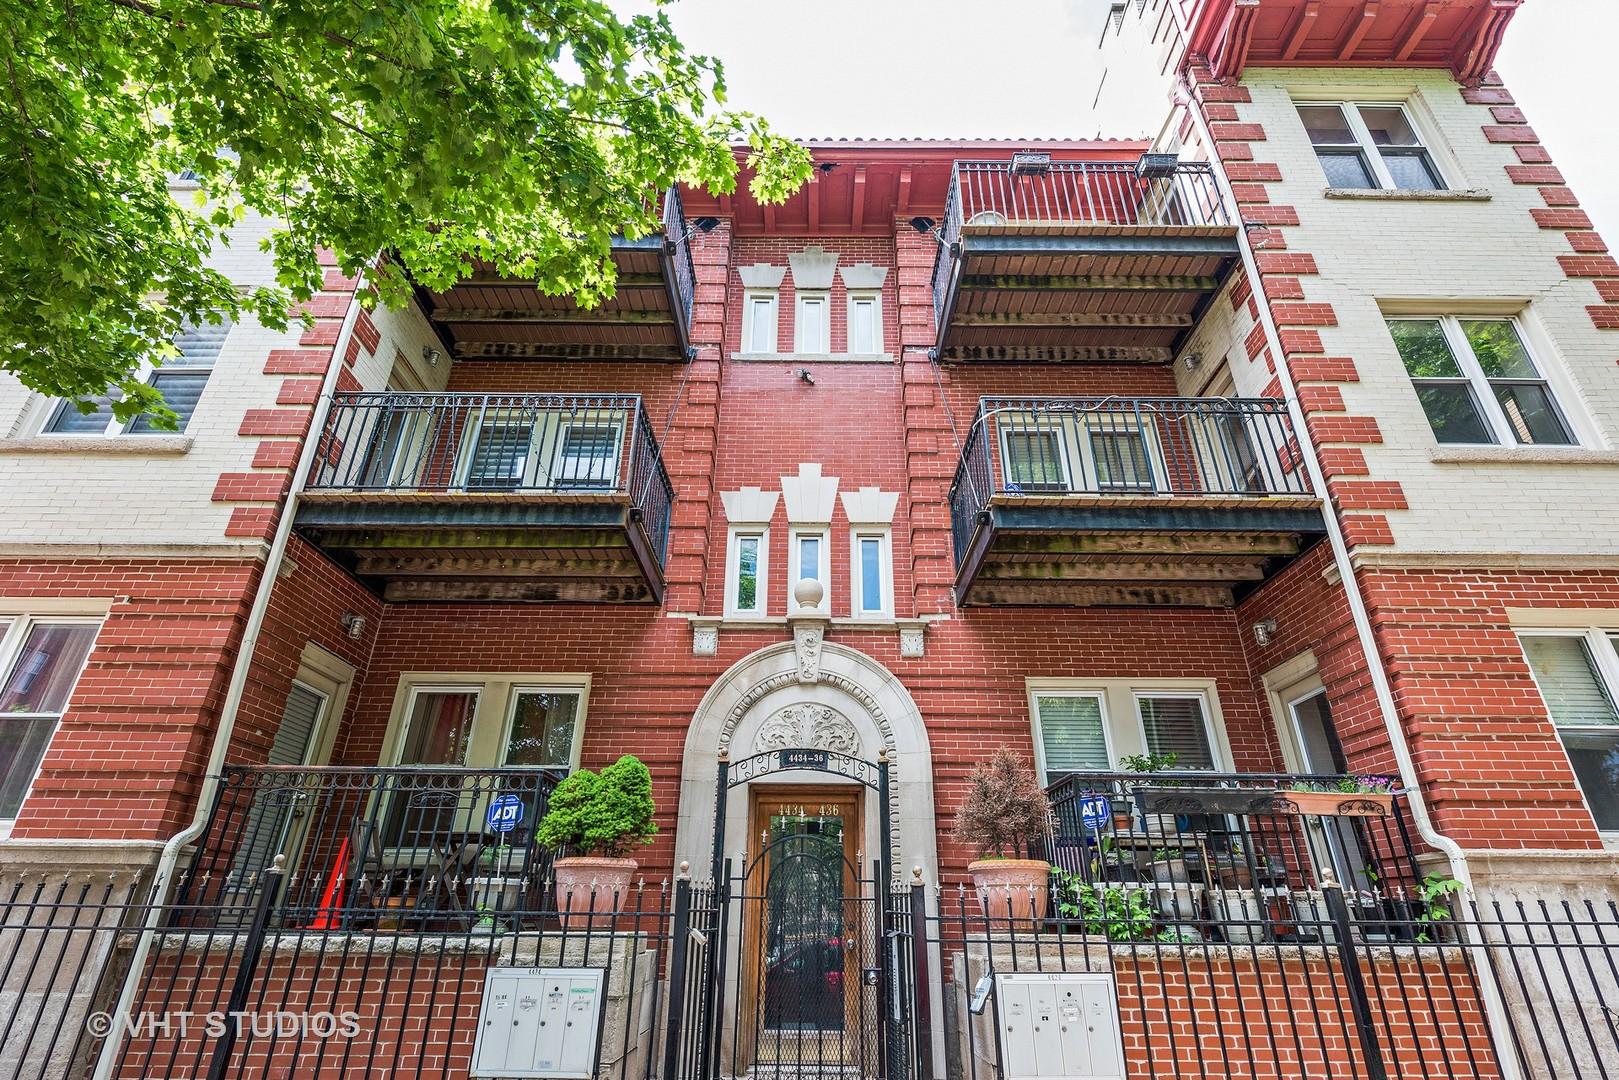 cullom black singles Property type single family residence exterior finish masonry year built 1997 lot size 6621  7942 cullom ct, blacklick, oh 43004 $216,122 off market est .